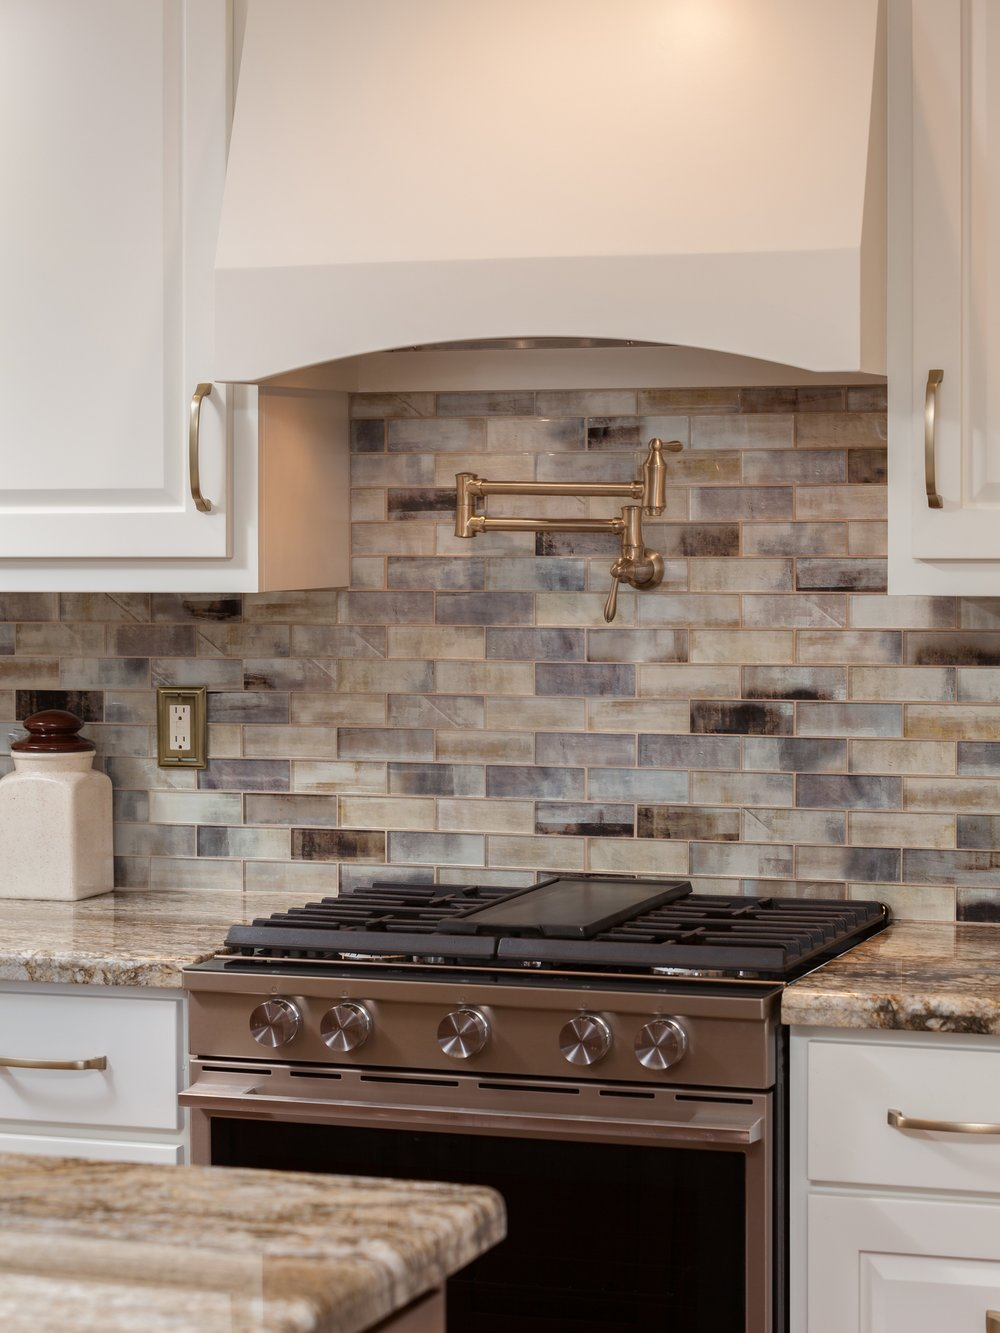 Glenshire Open Concept Kitchen Remodel in Chico, Ca